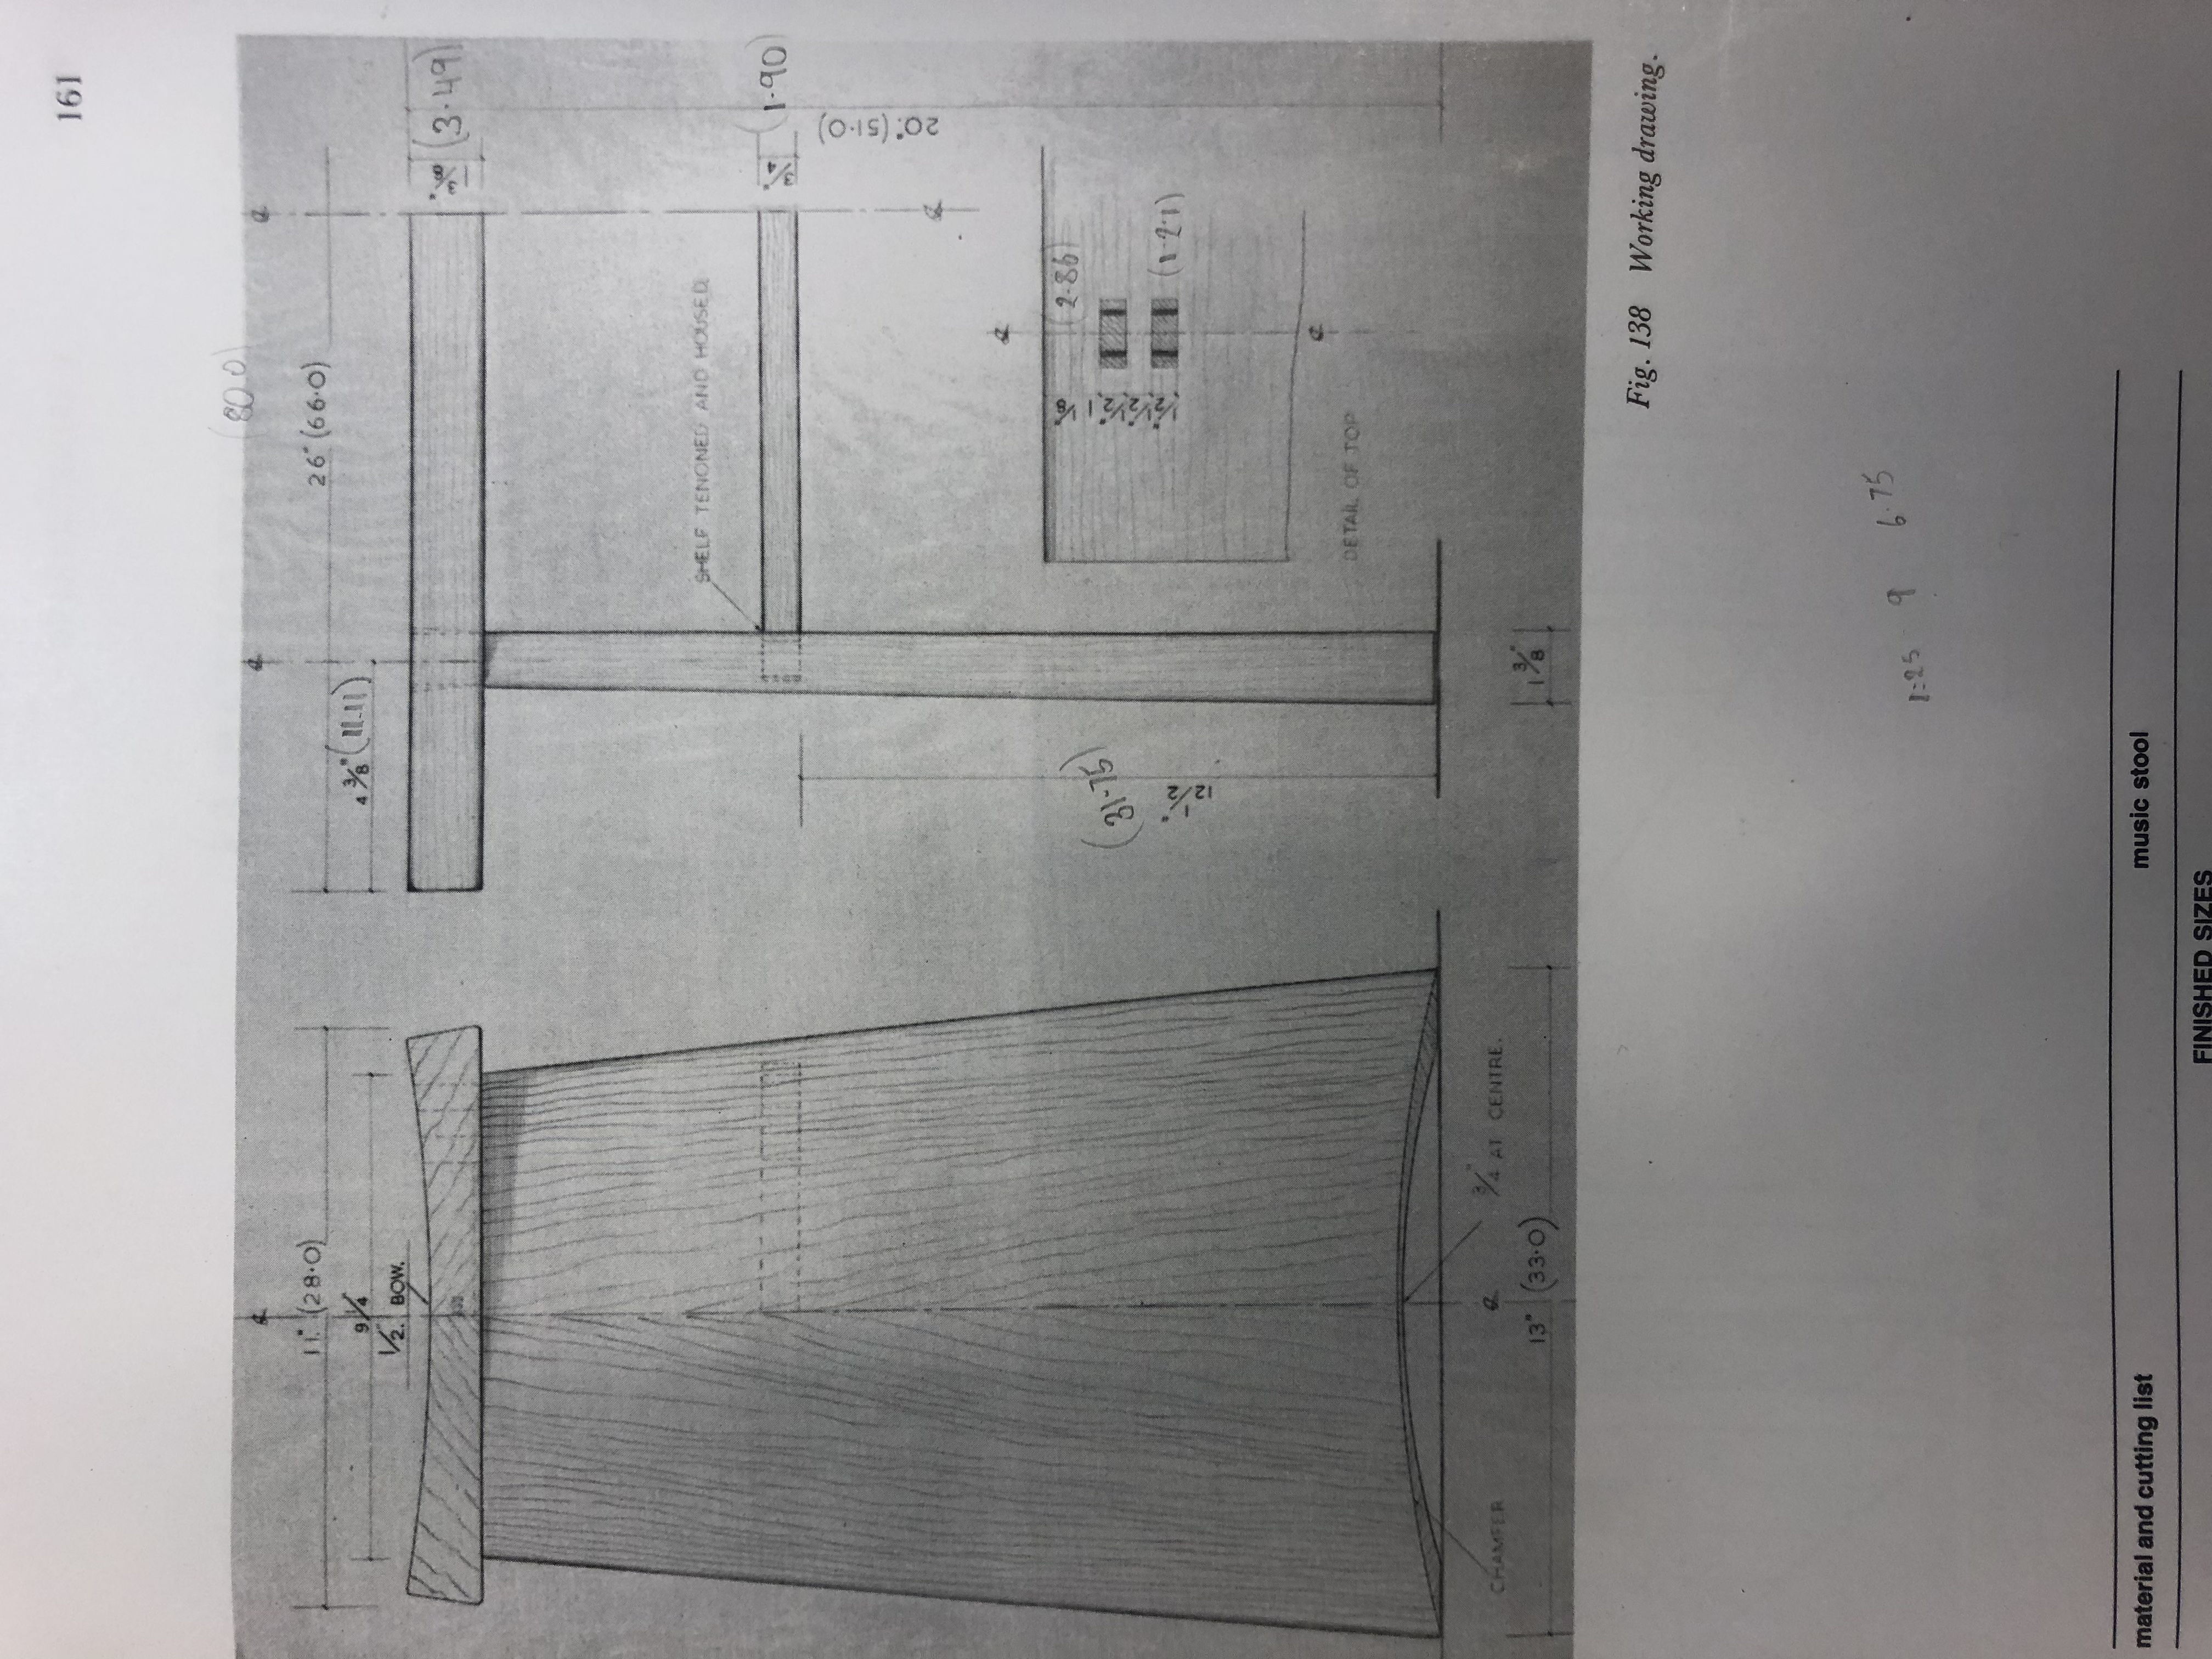 8CCF5F49-D0C5-49BD-8542-7CDE73C9AE22.jpeg